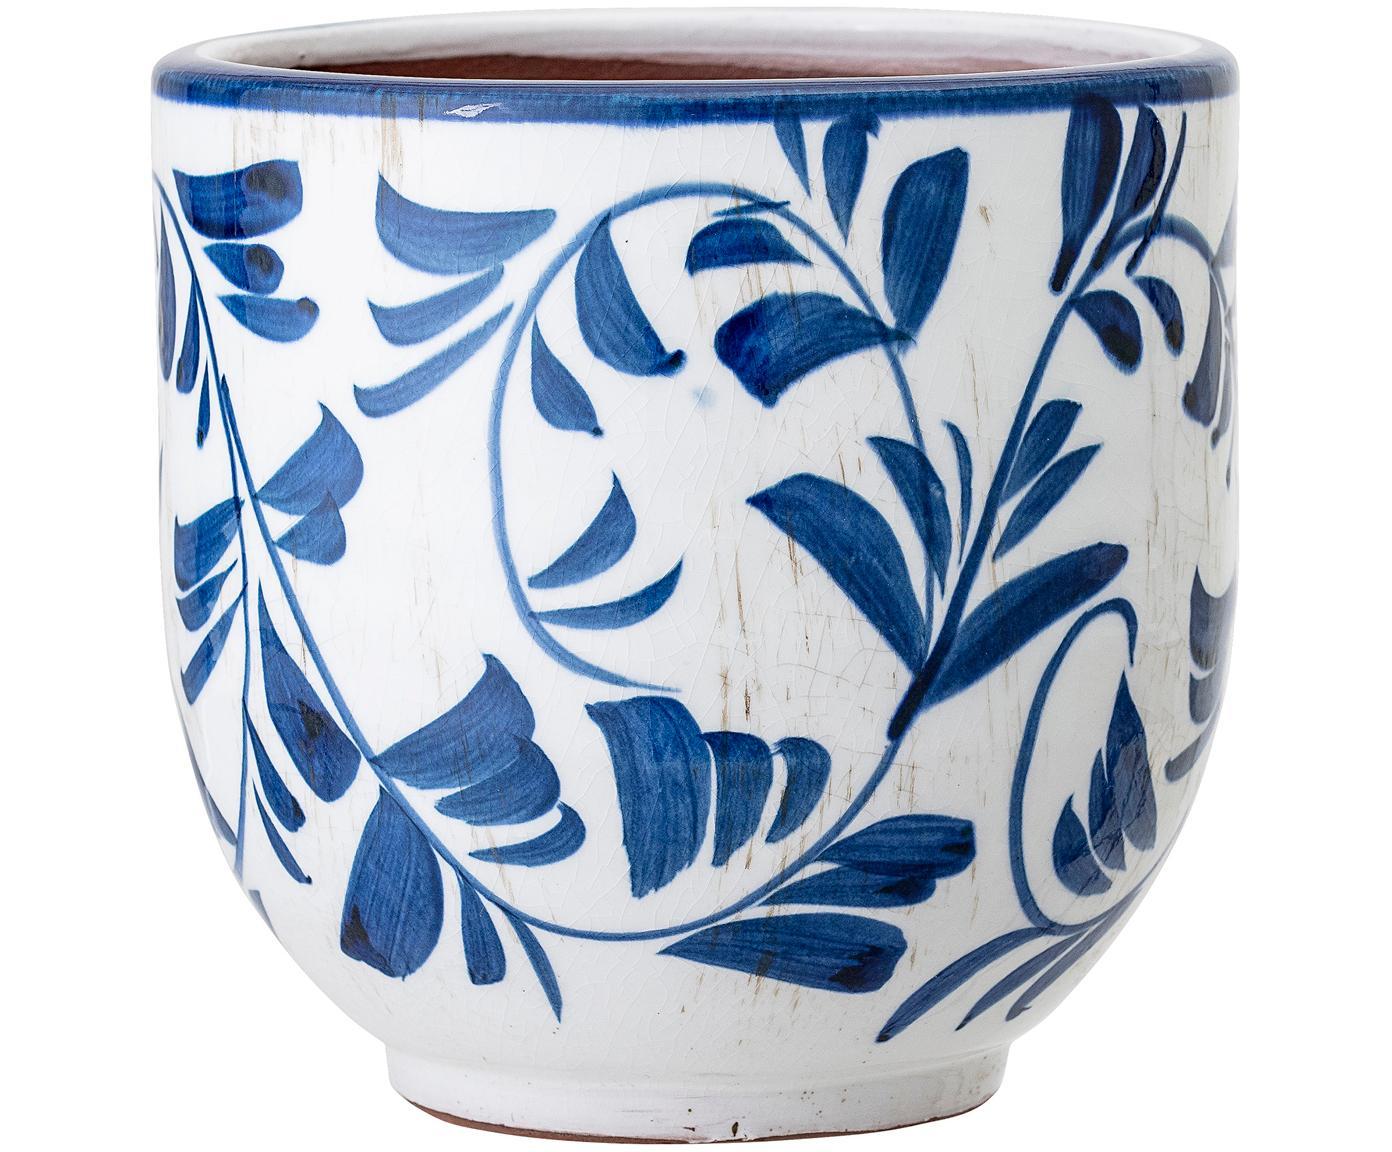 Plantenpot Jarl, Terracotta, Blauw, wit, Ø 14 cm